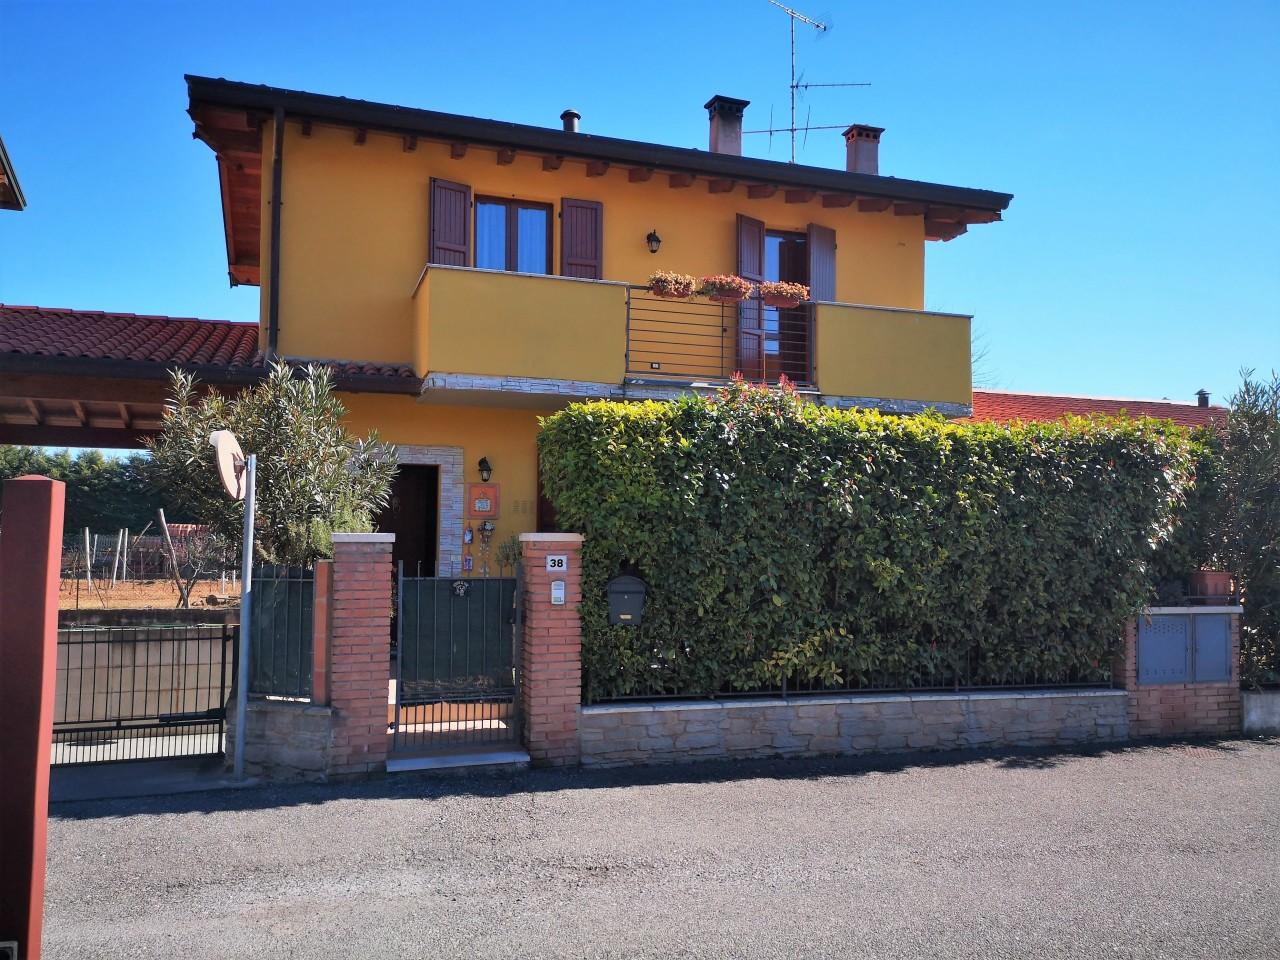 Semindipendente - Villa a schiera a Prevalle